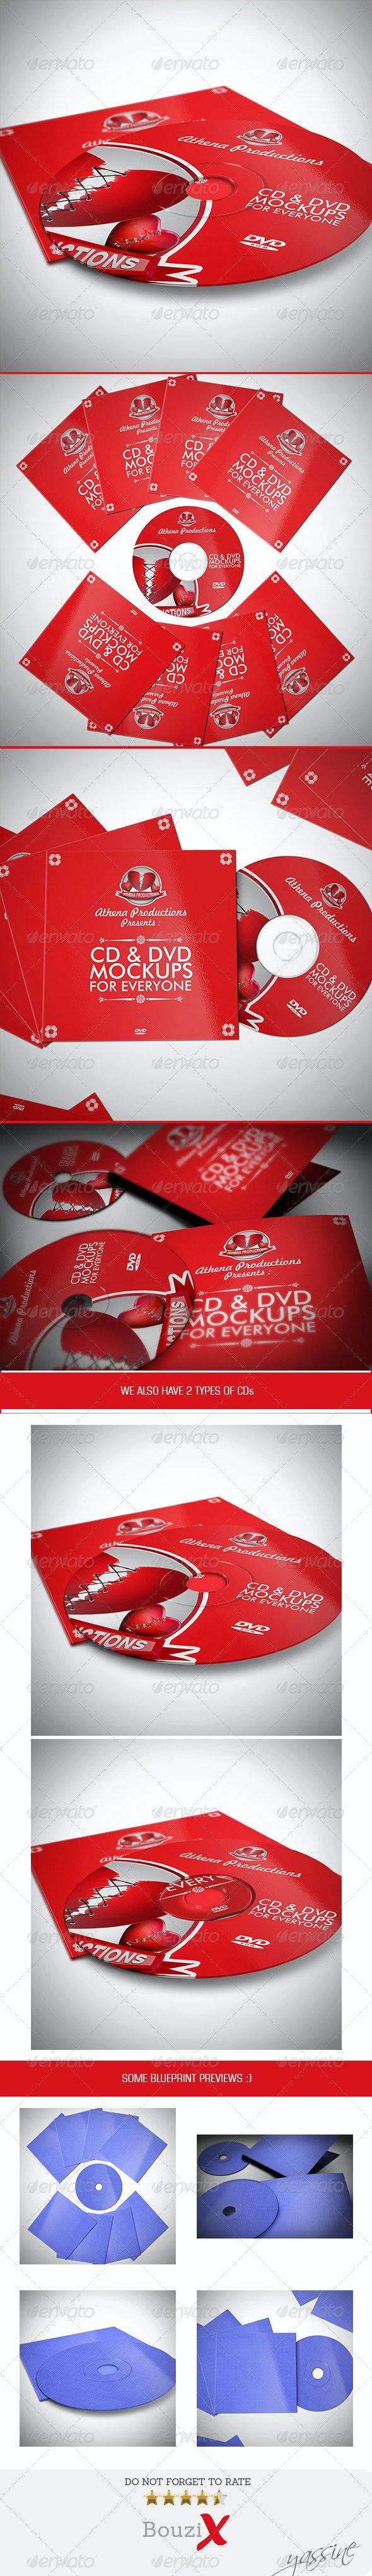 CD Sleeve & Sticker Mockups - Product Mock-Ups Graphics